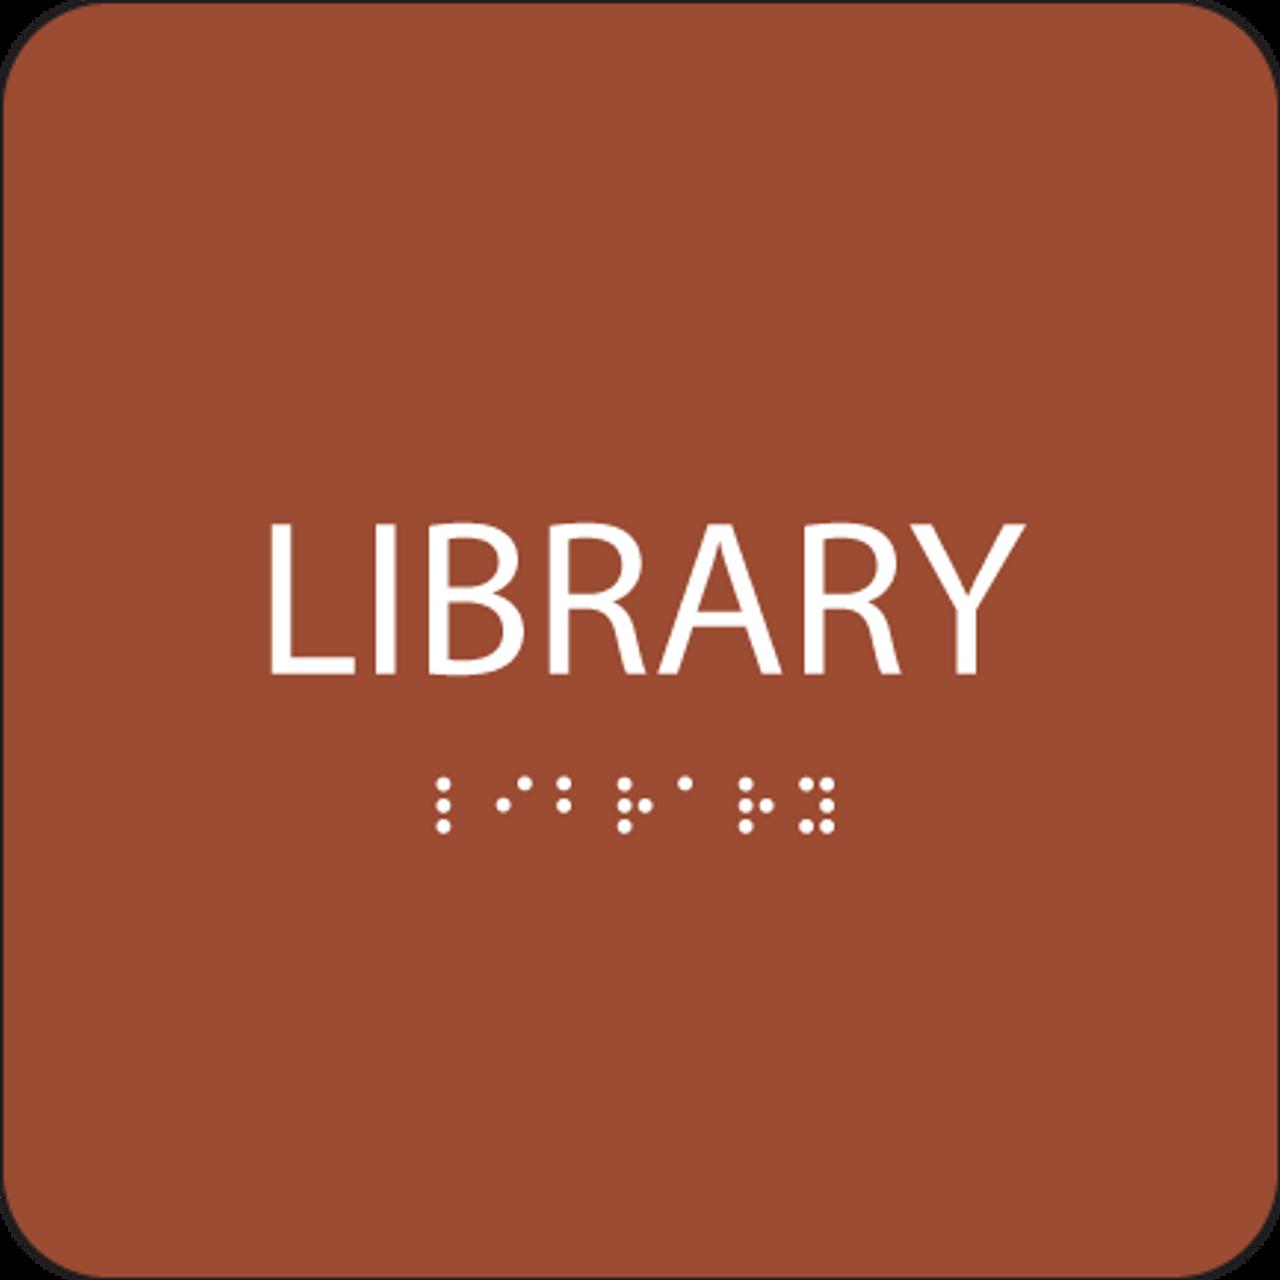 Orange Library ADA Sign